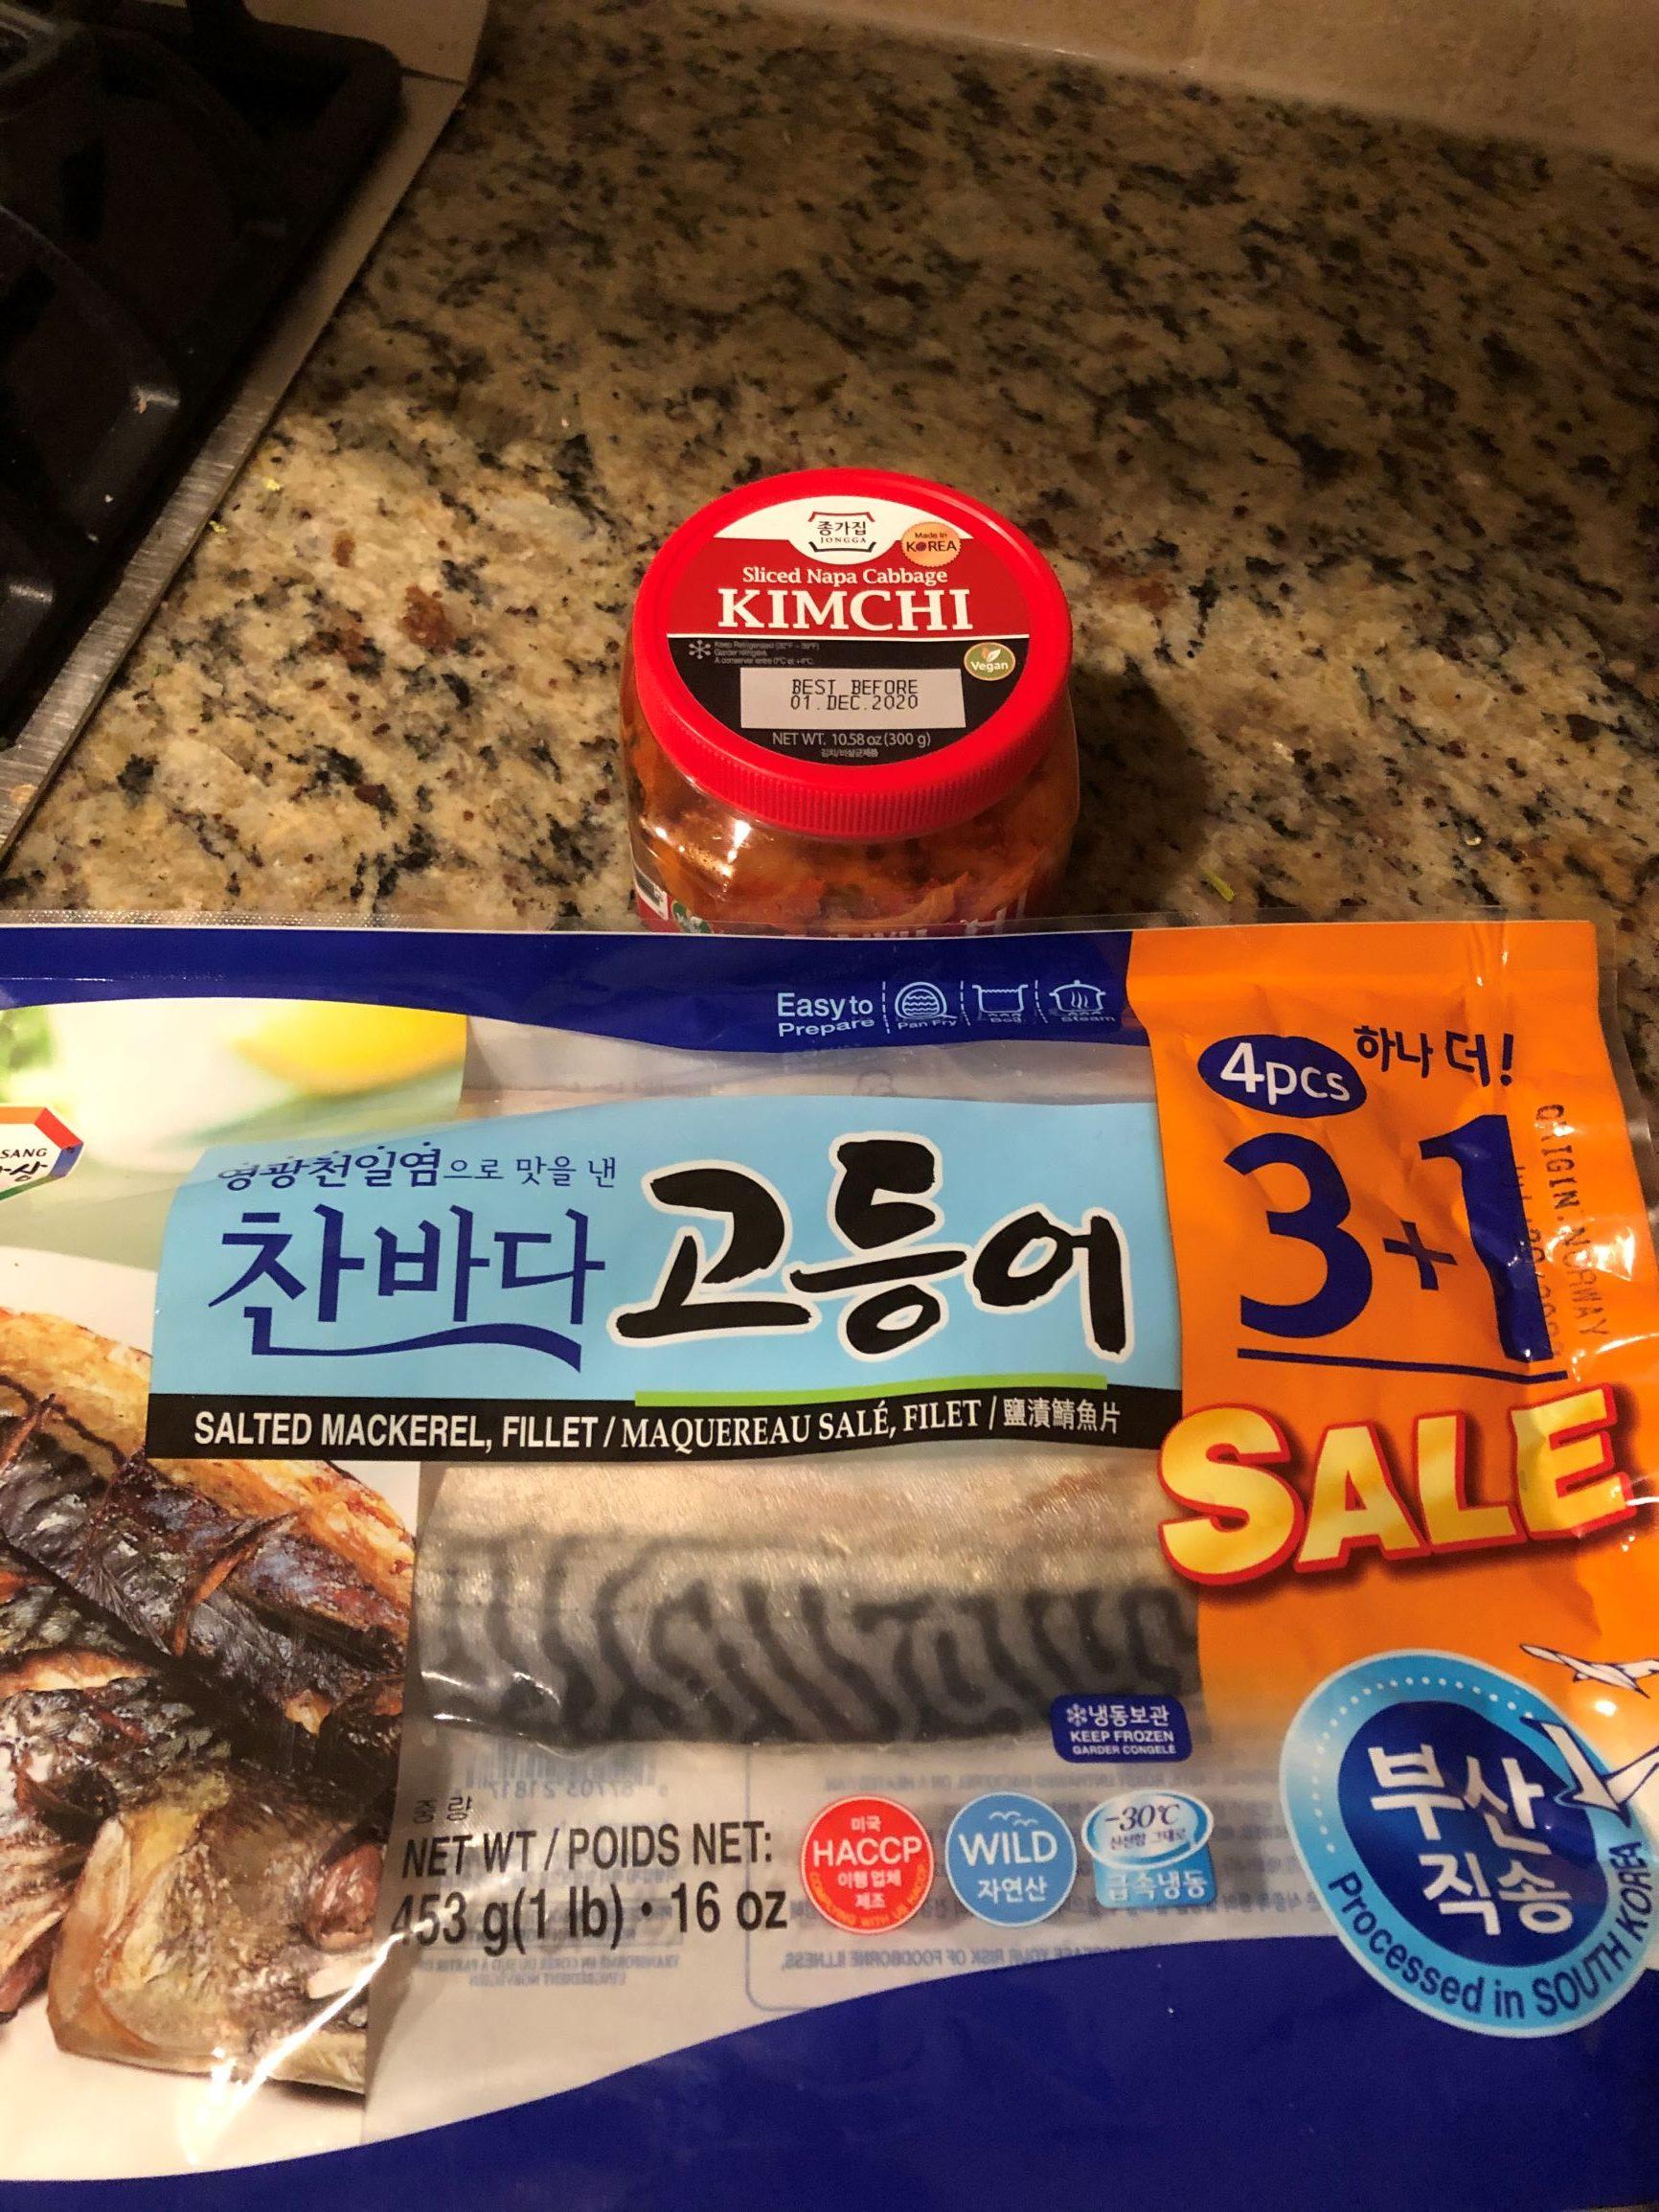 Korean Kimchi and Salted Mackerel Filet